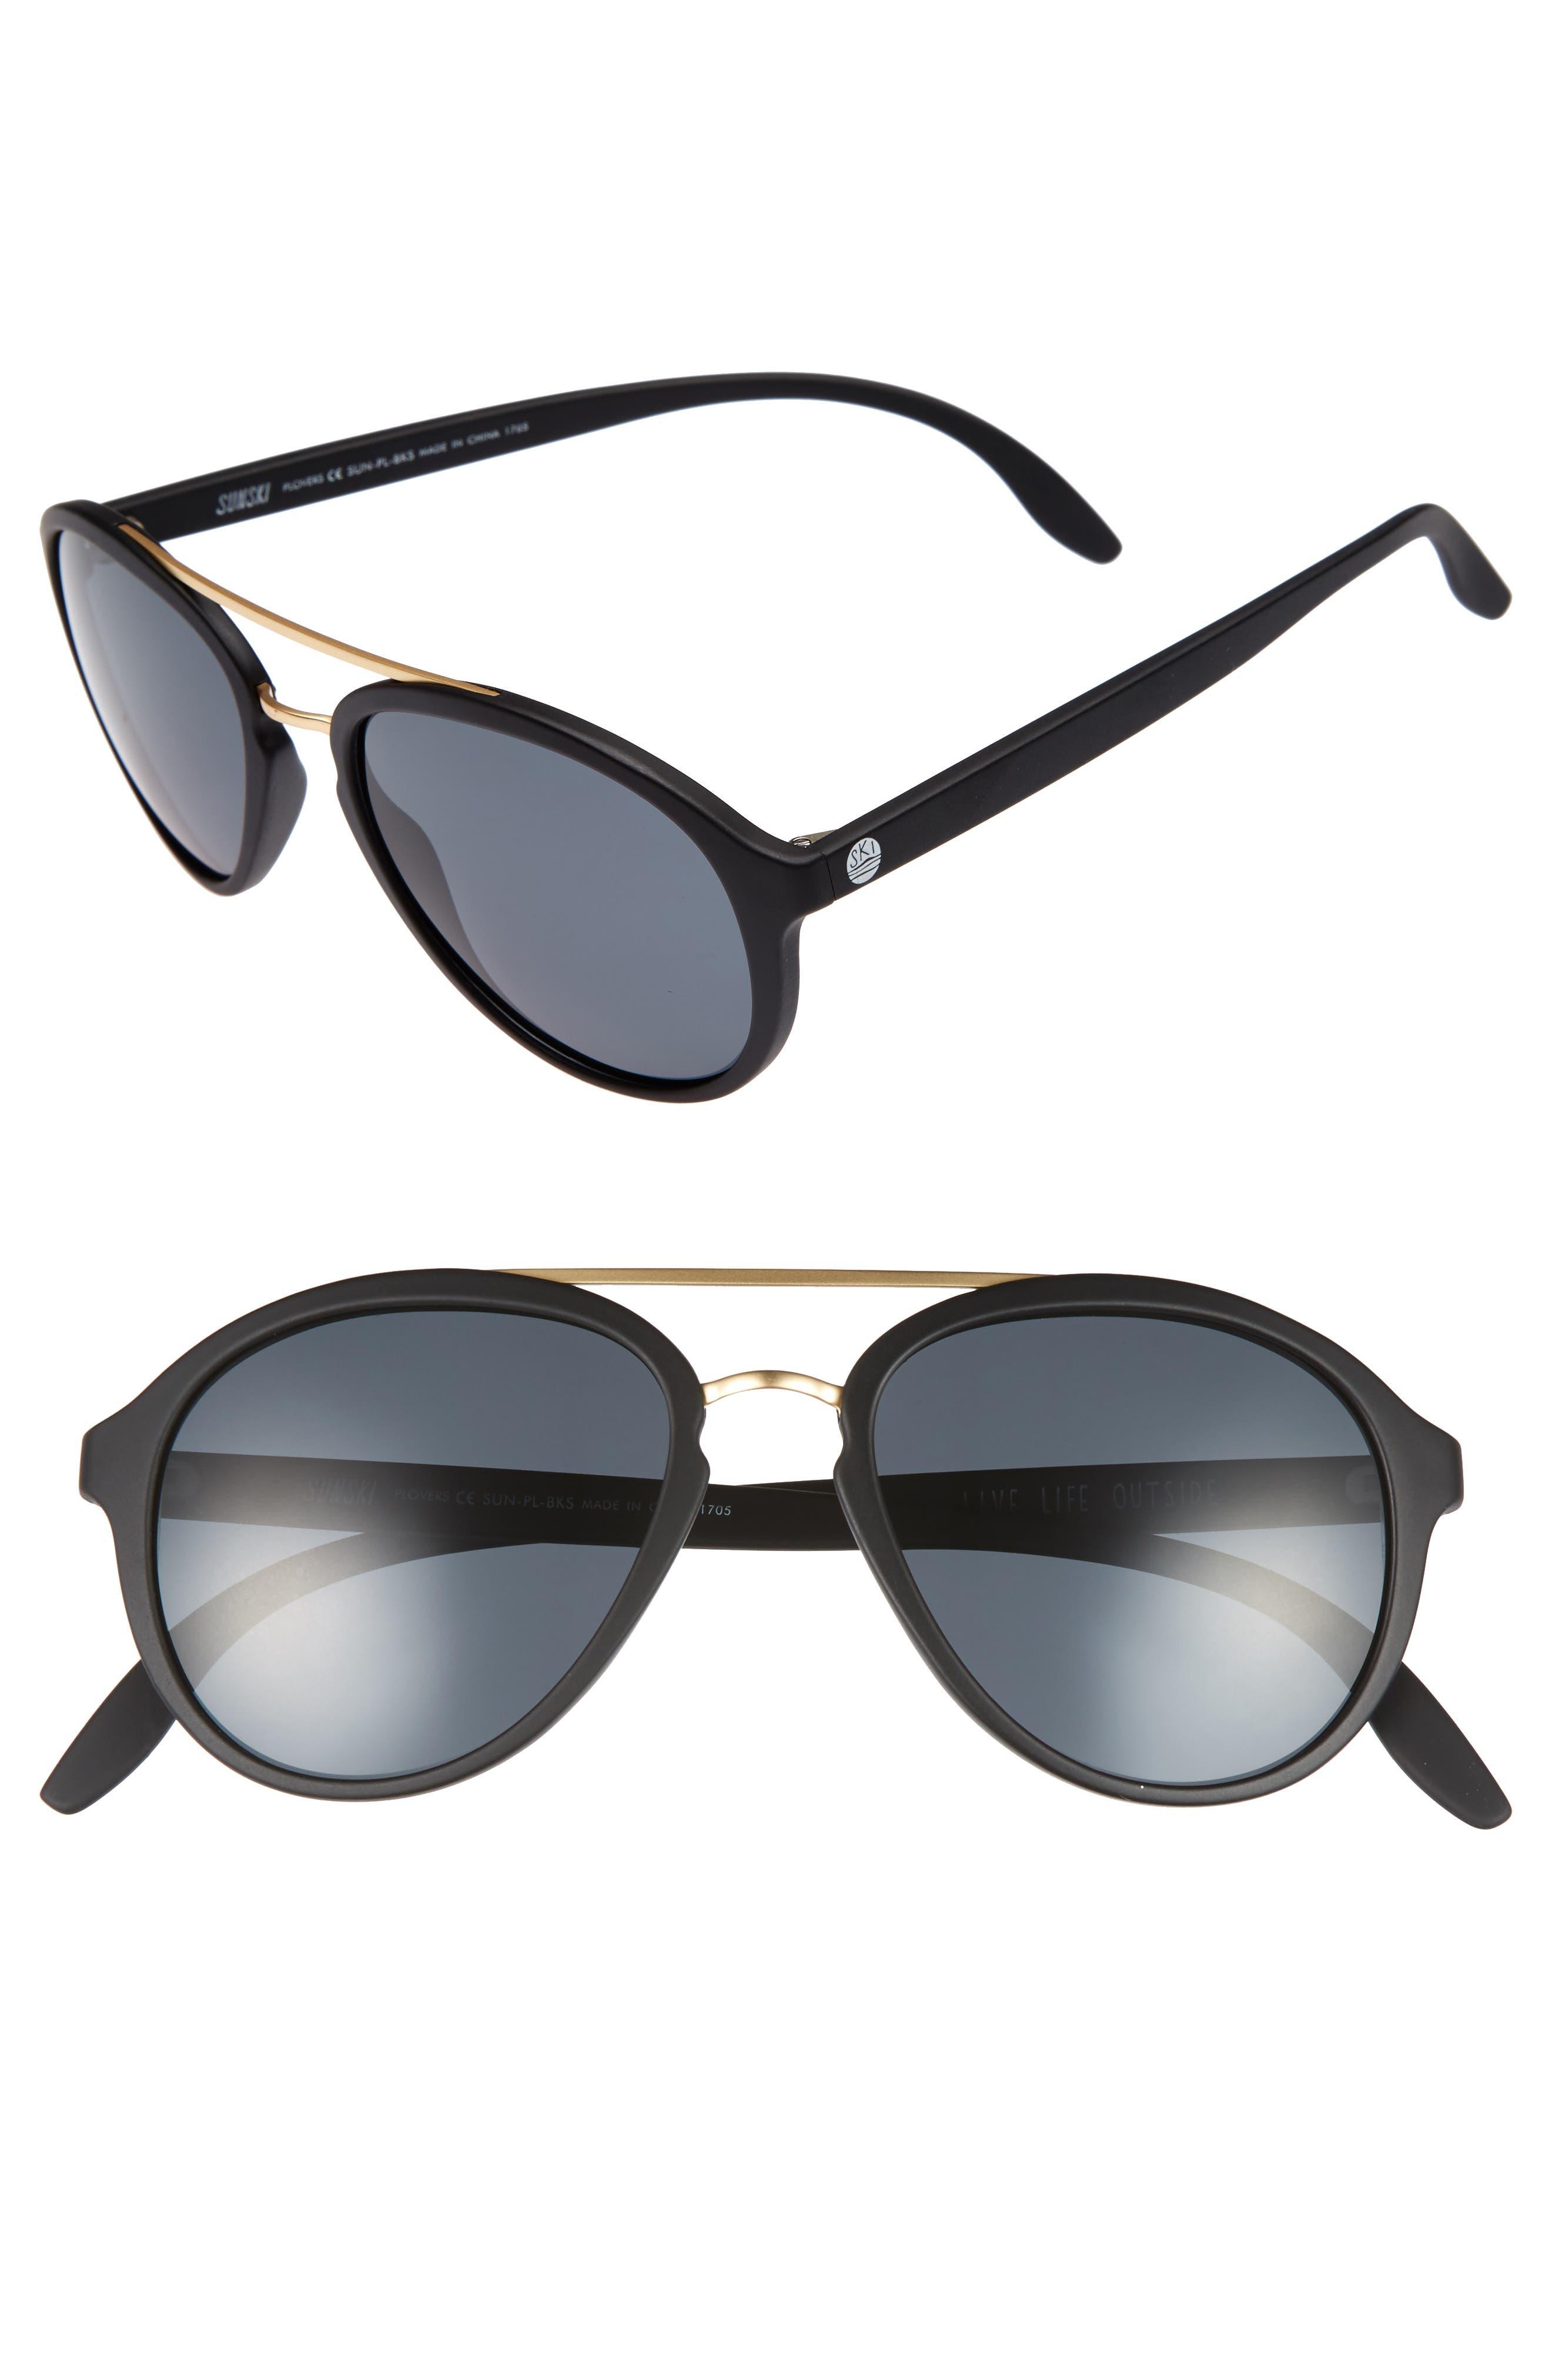 Plover 60mm Polarized Sunglasses,                             Main thumbnail 1, color,                             BLACK/ SLATE